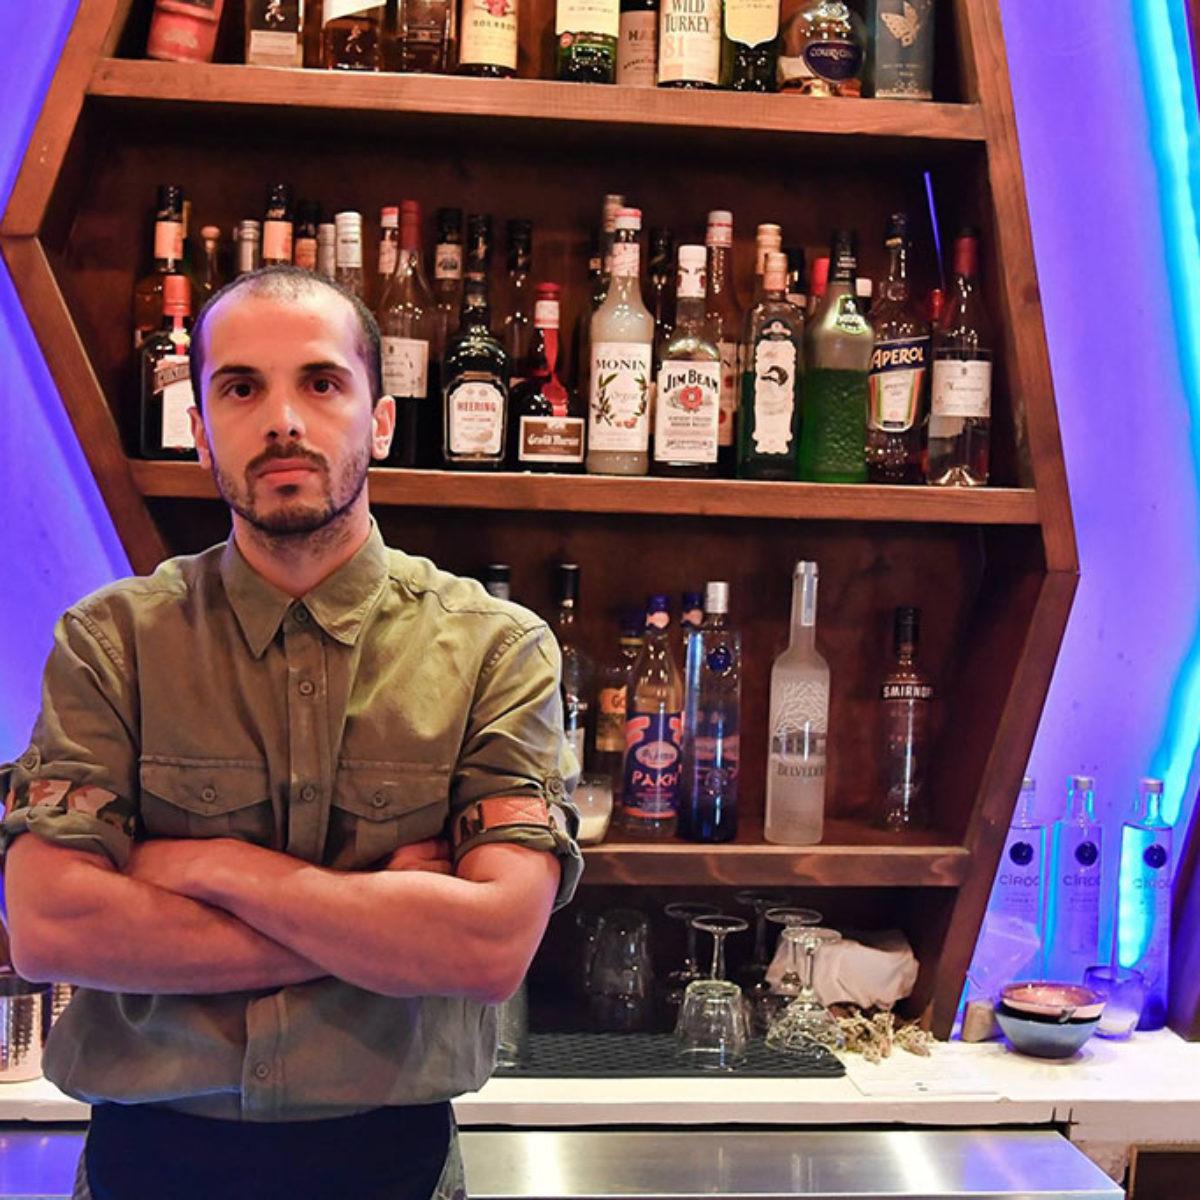 Yiamas Gastro Bar - Καλαμάτα - Μοντέρνα Ευρωπαϊκή Κουζίνα - Team 5